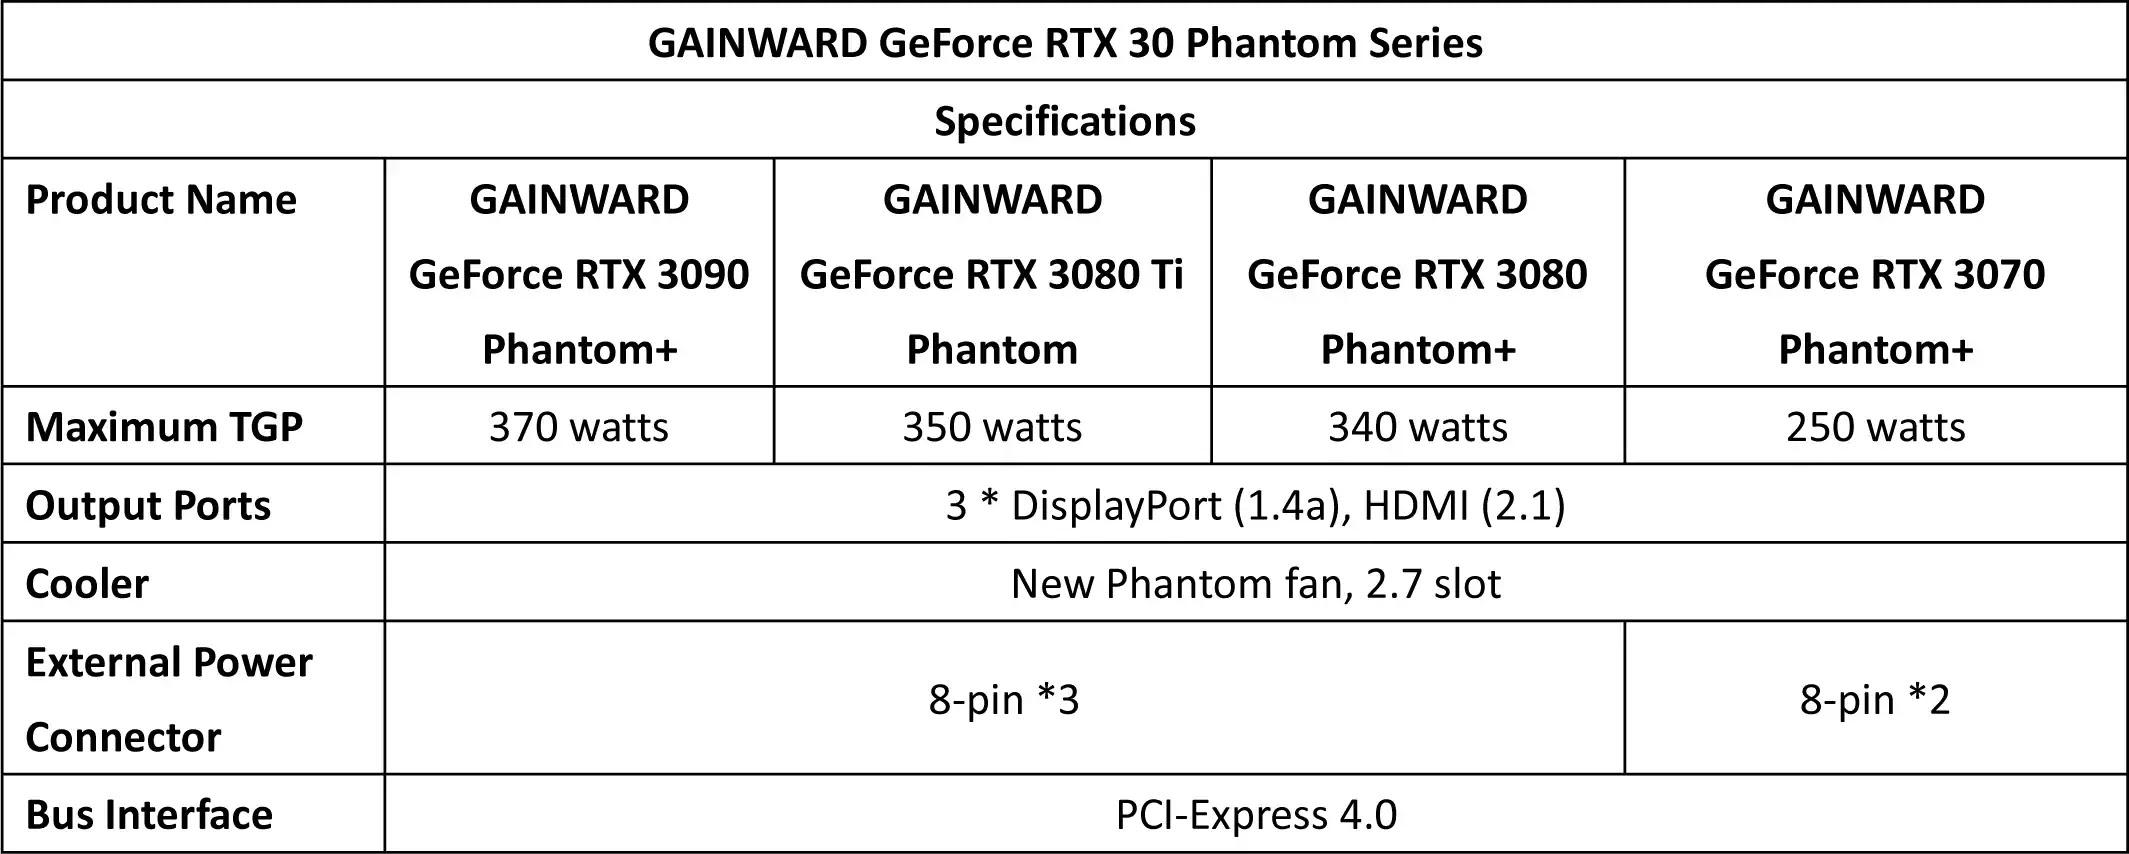 GAINWARD GeForce RTX 30 Phantom Series Specs